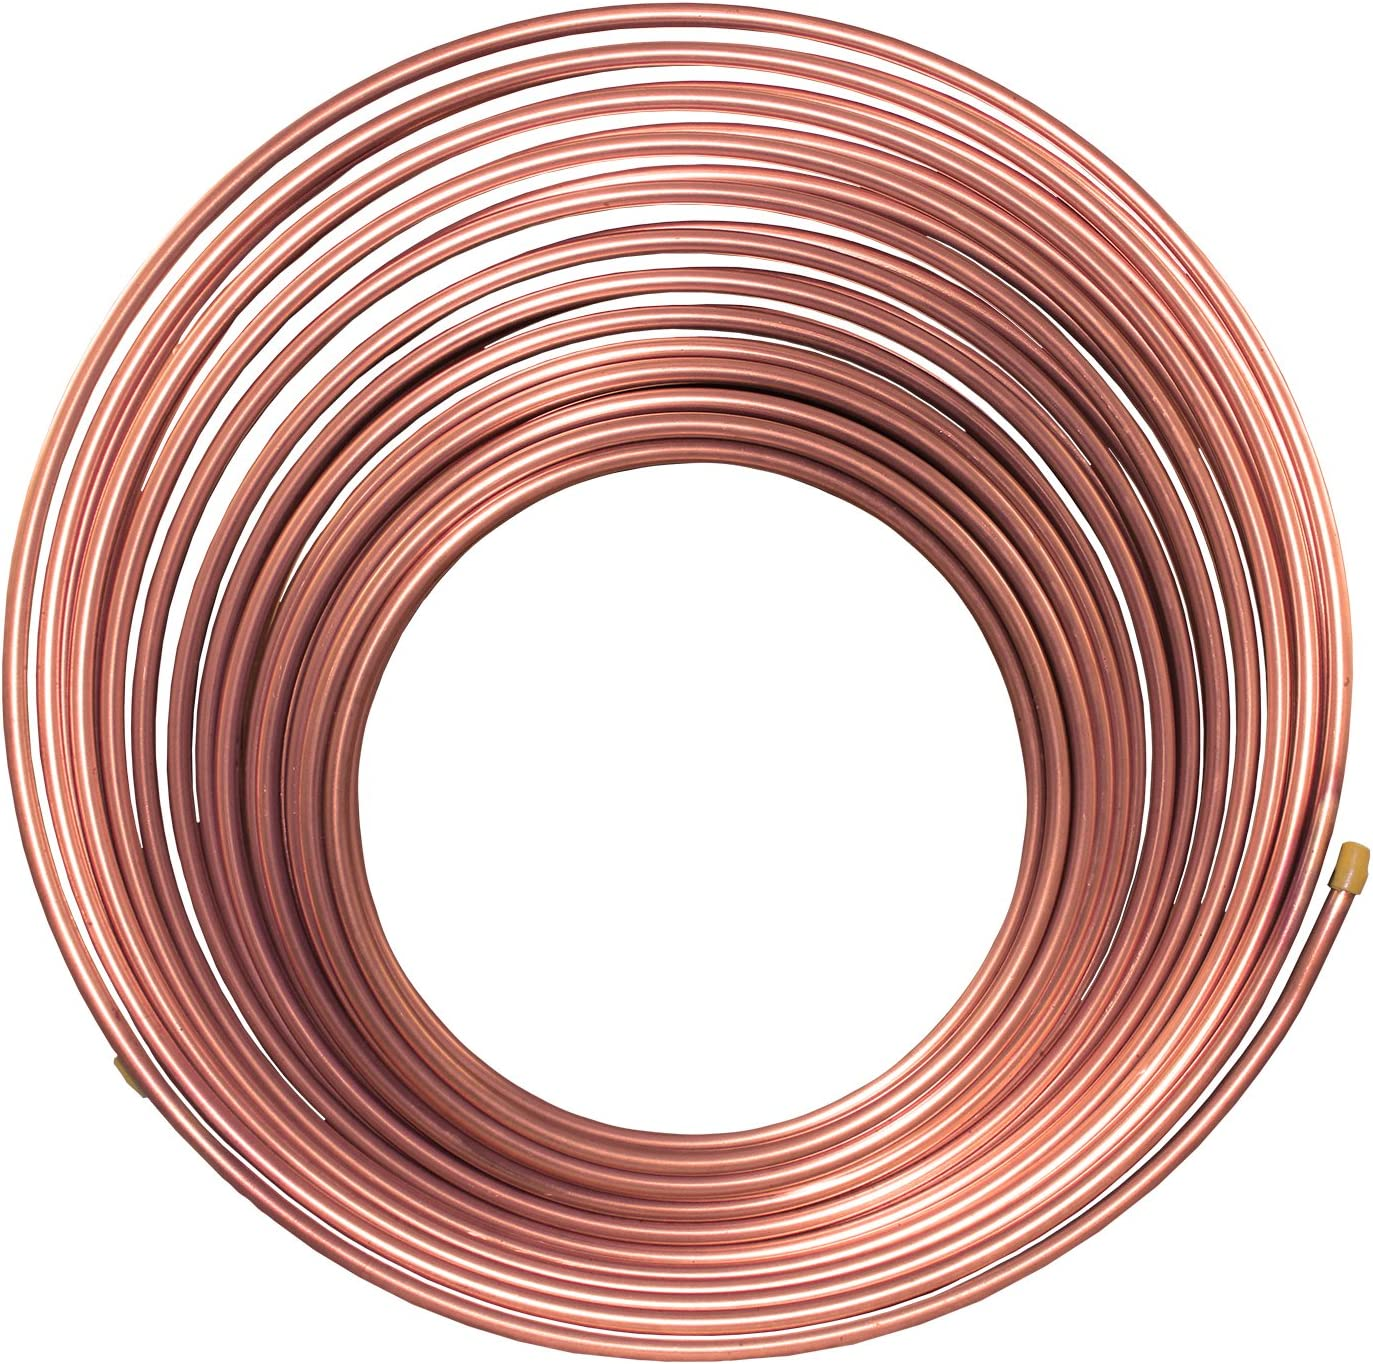 NiCopp Nickel//Copper Brake//Fuel//Transmission Line Tubing Coil 5//16 x 25